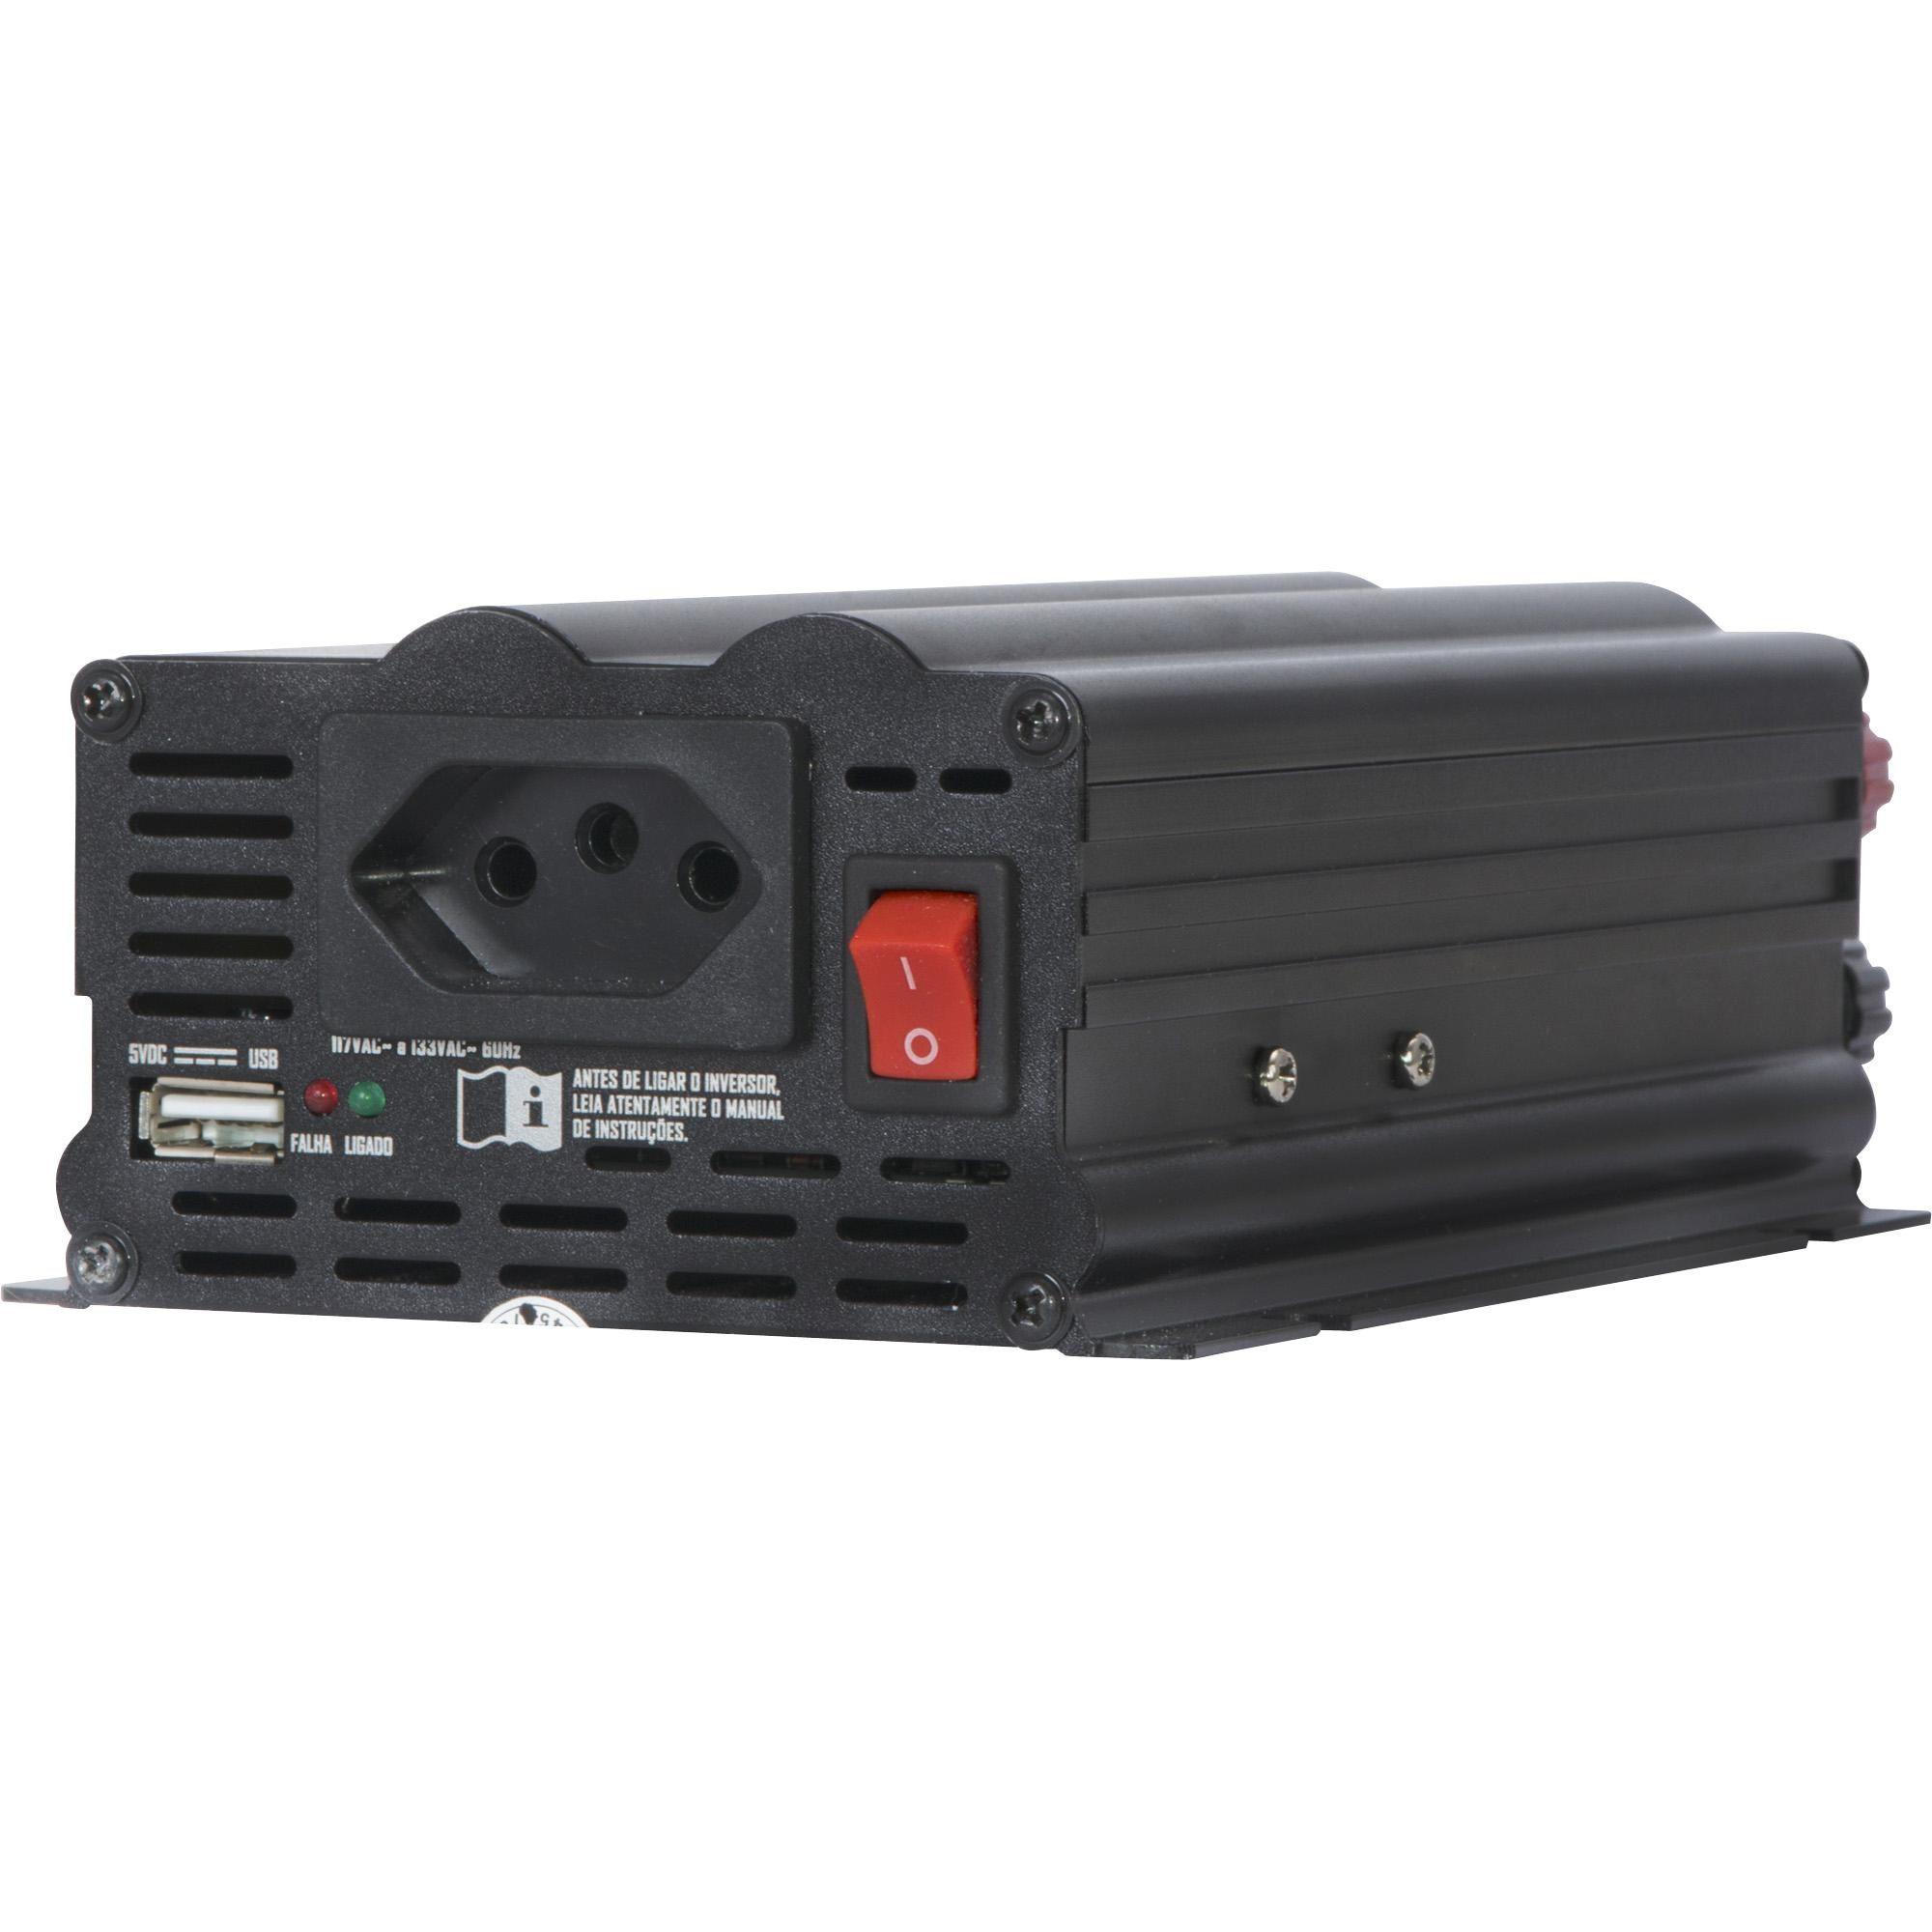 INVERSOR HAYONIK 500W 12VDC/127V USB MODIFICADA - GD